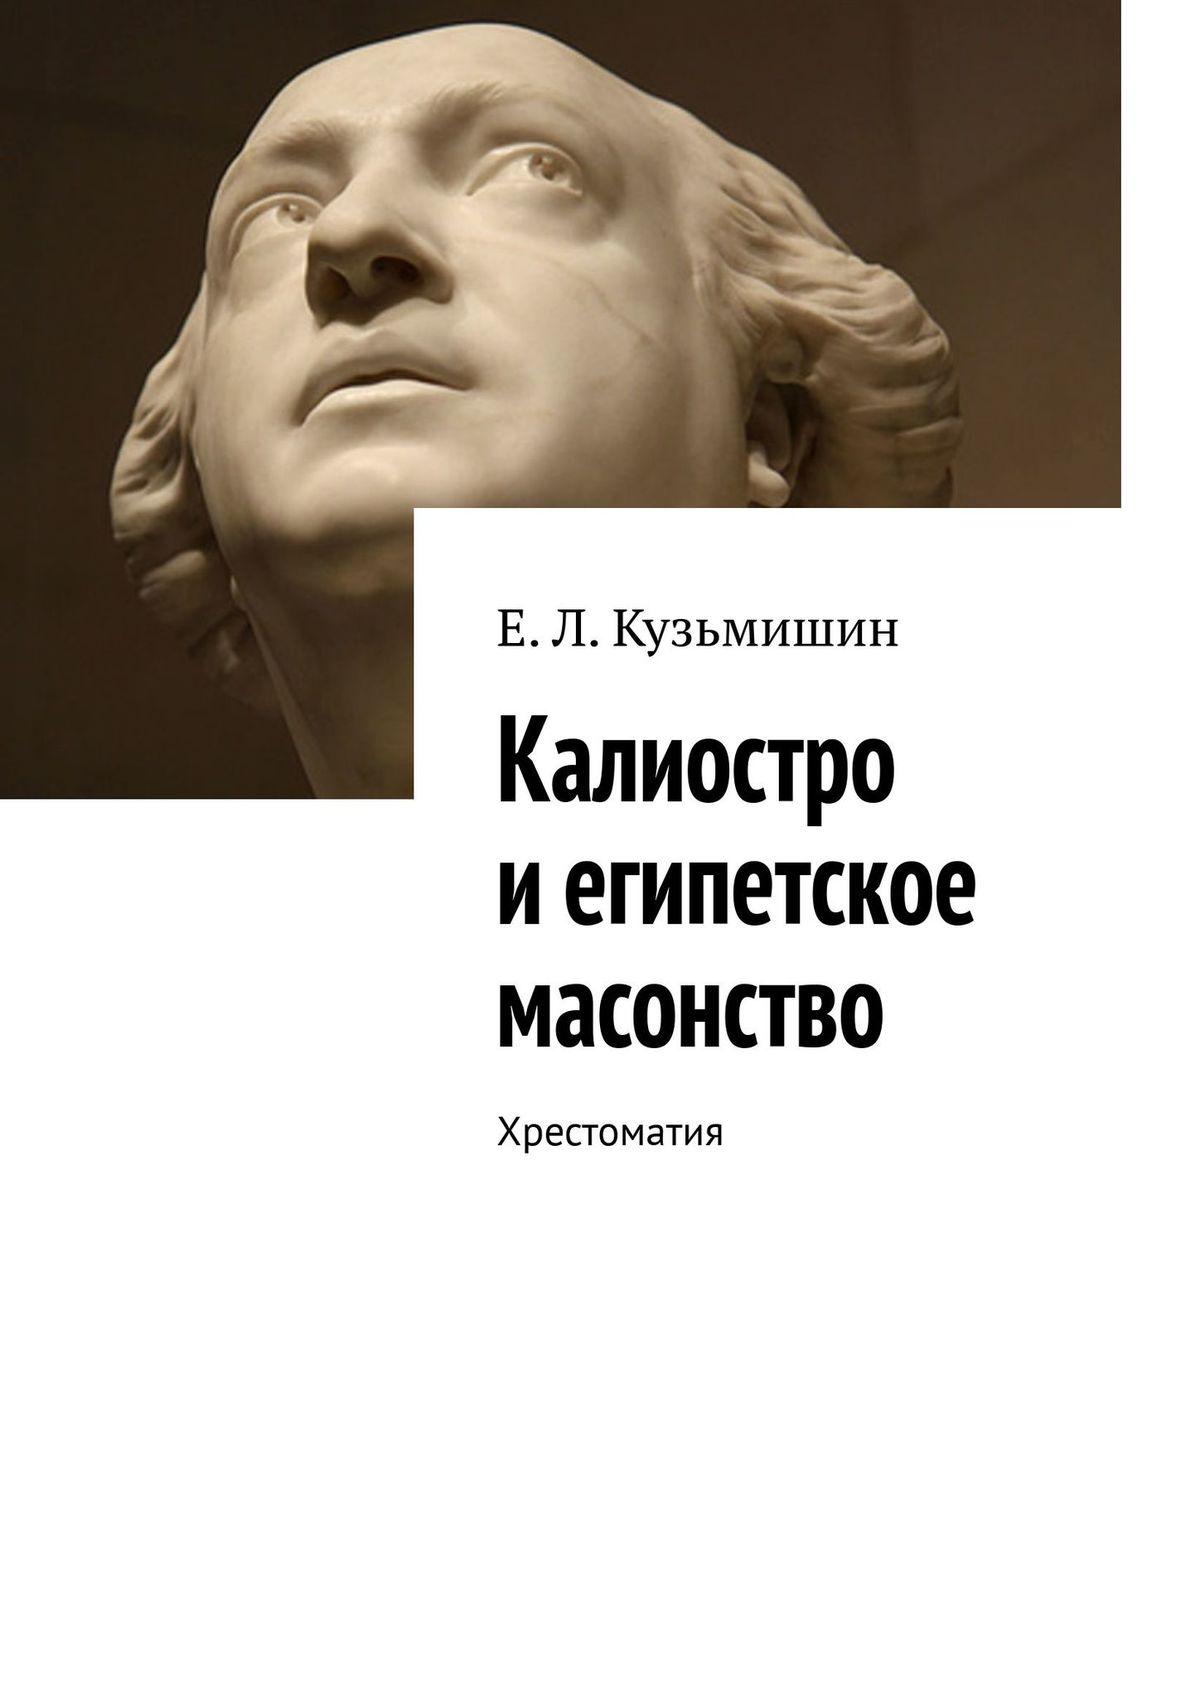 Е. Л. Кузьмишин Калиостро и египетское масонство